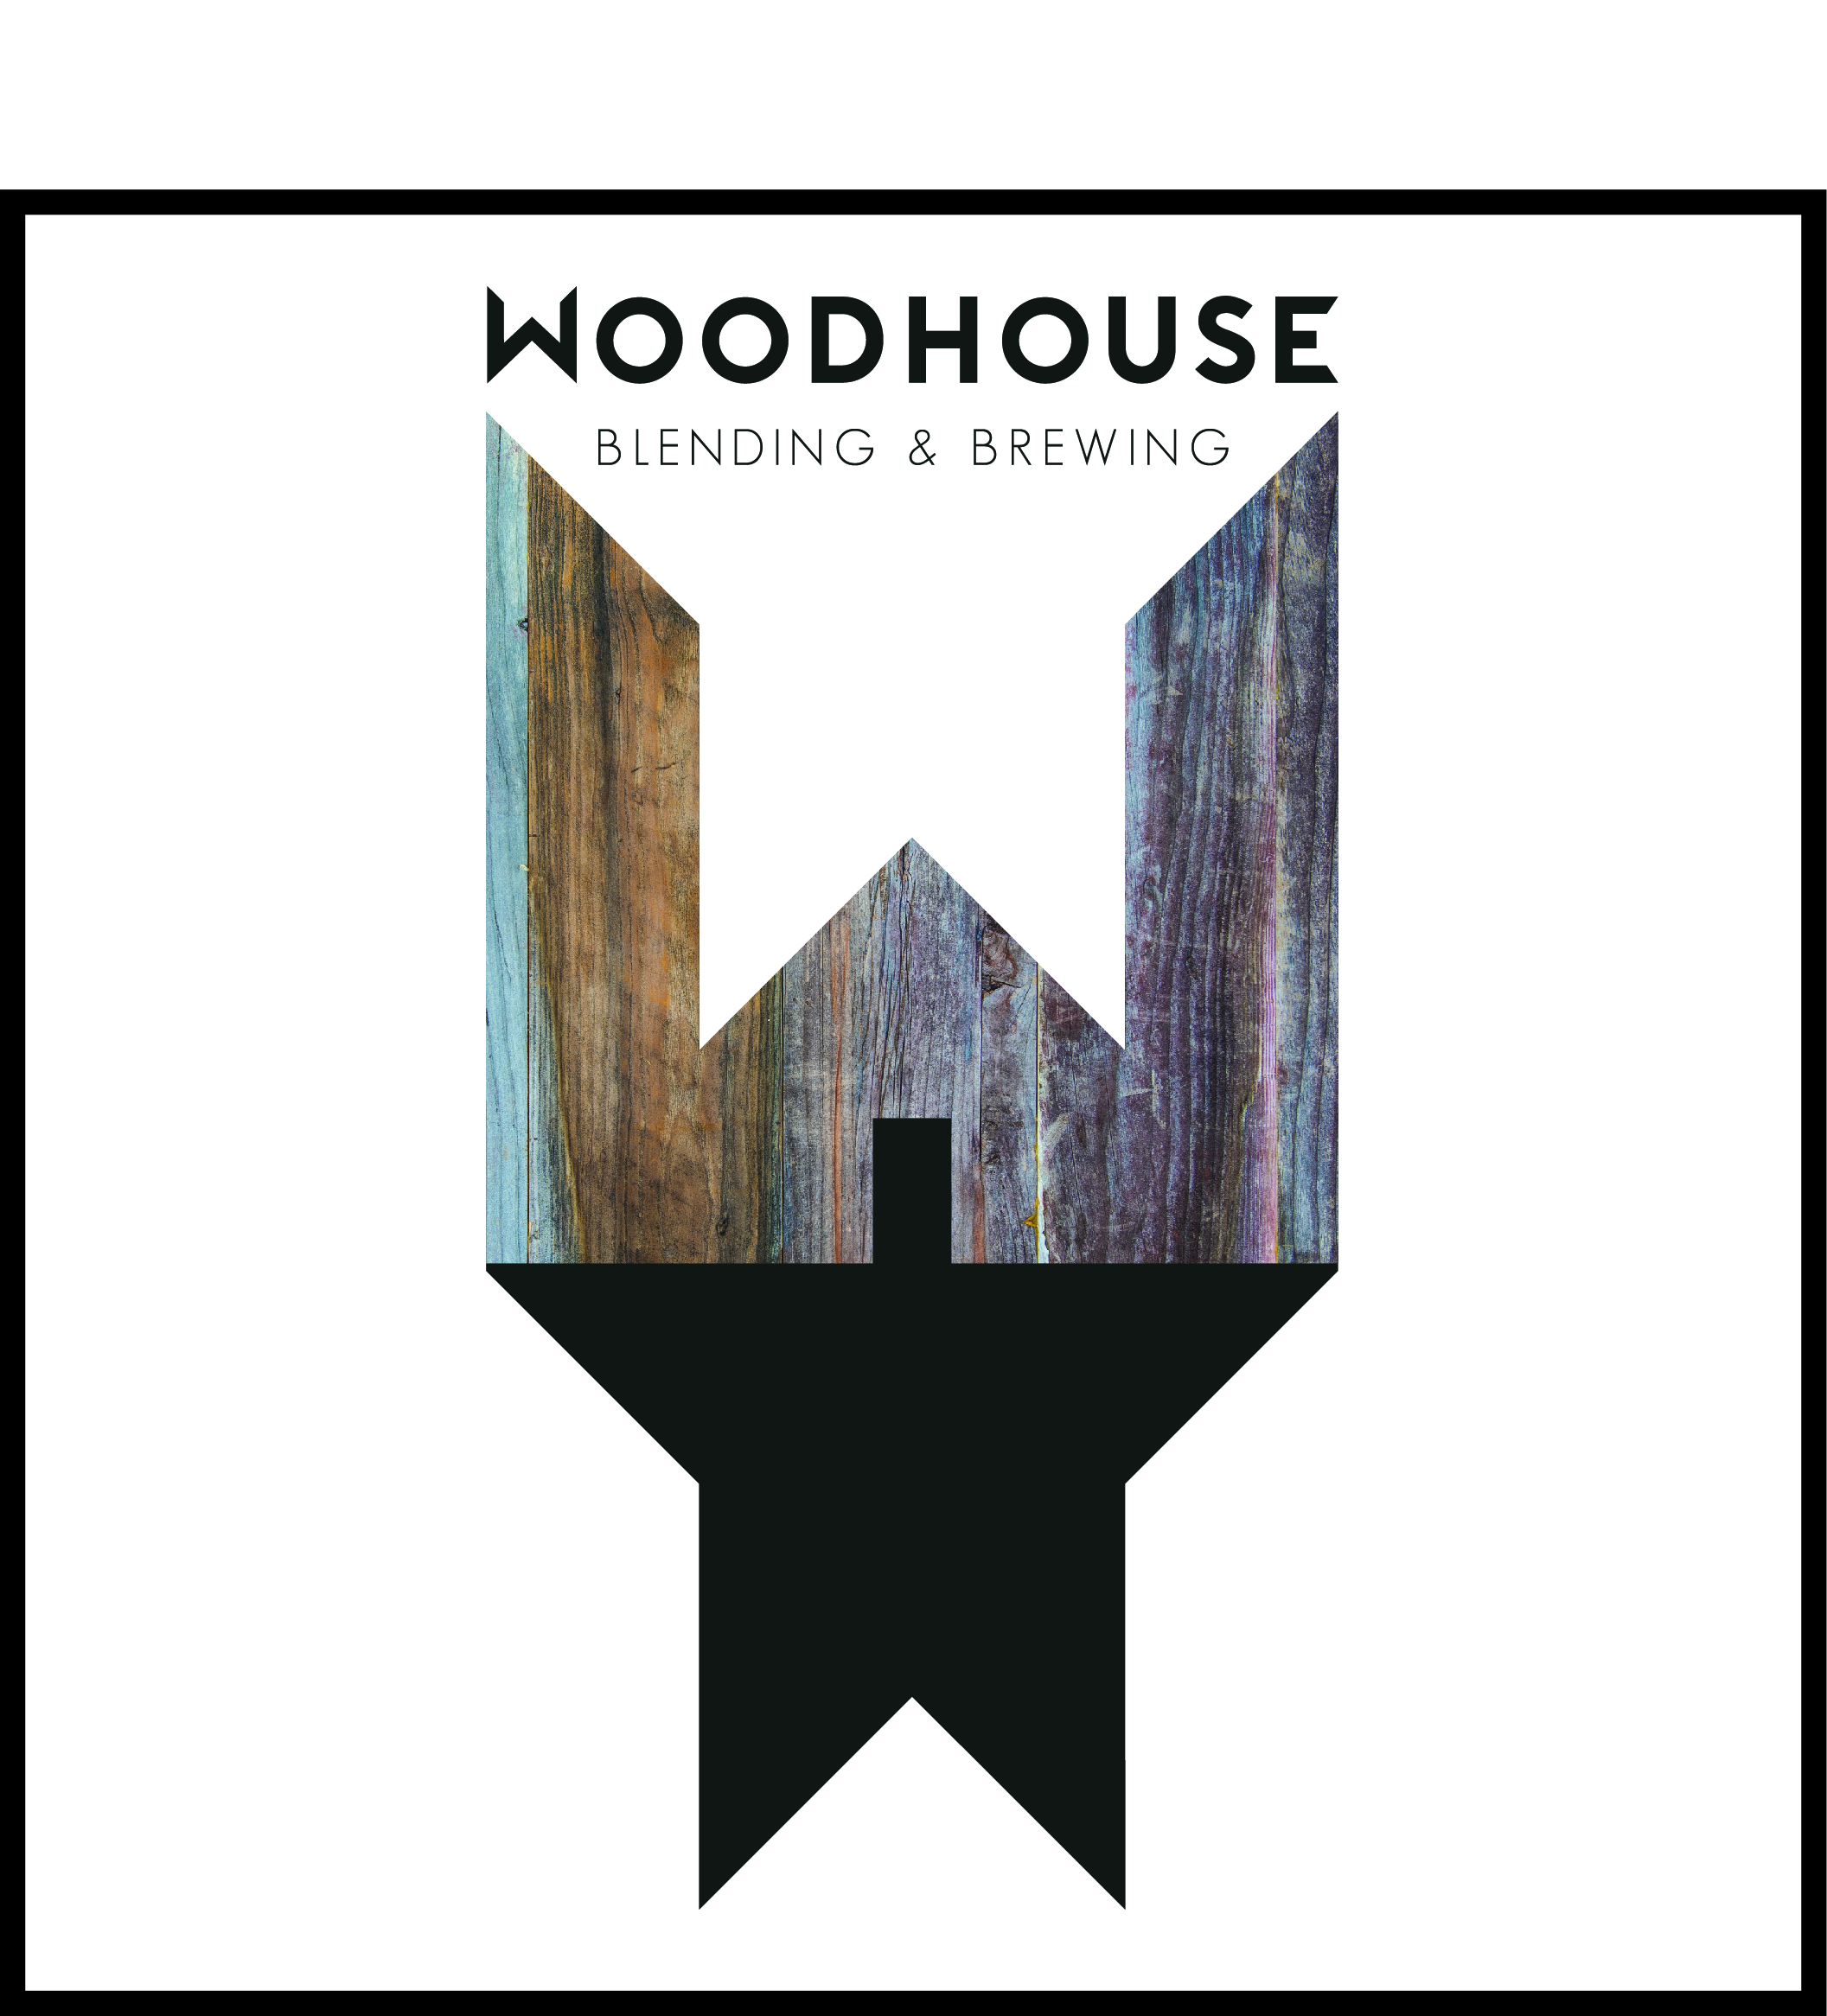 A_Woodhouse Final logo Rustic.jpg